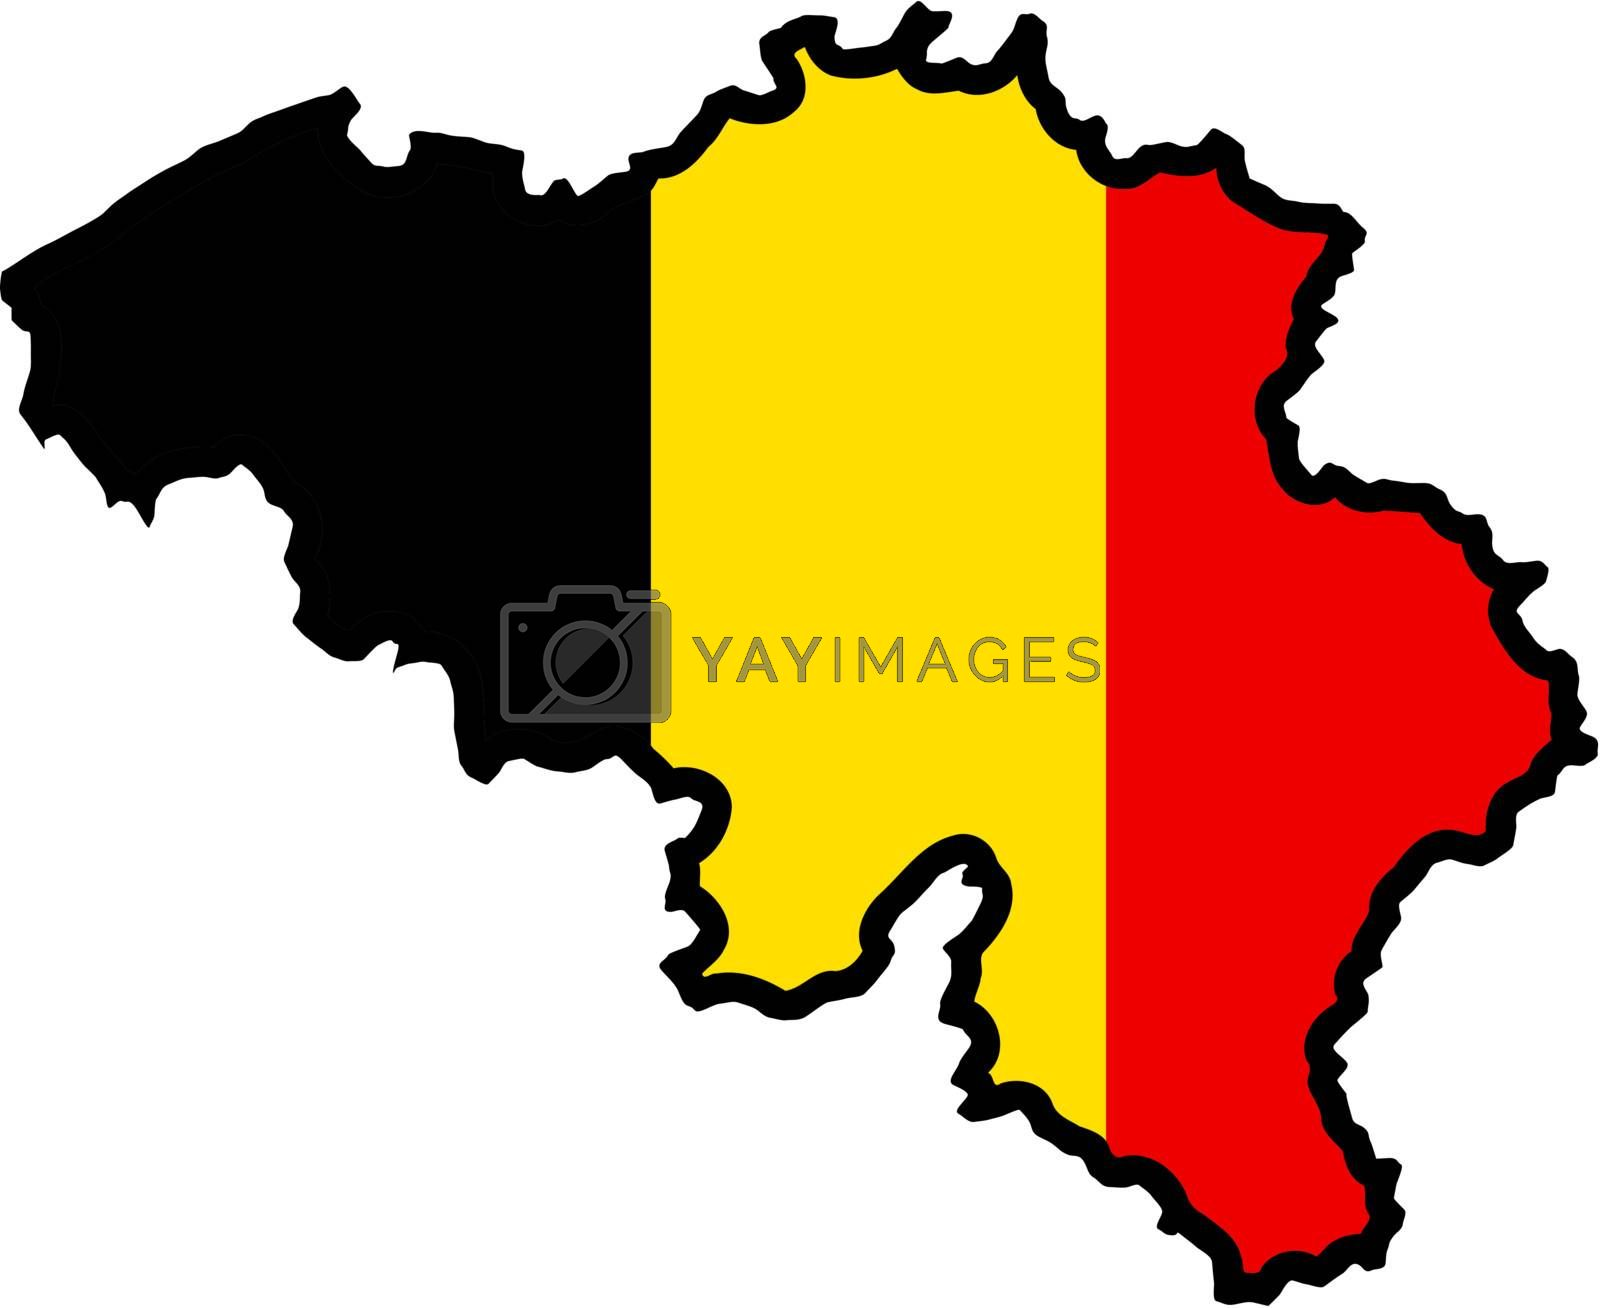 Illustration of flag in map of Belgium